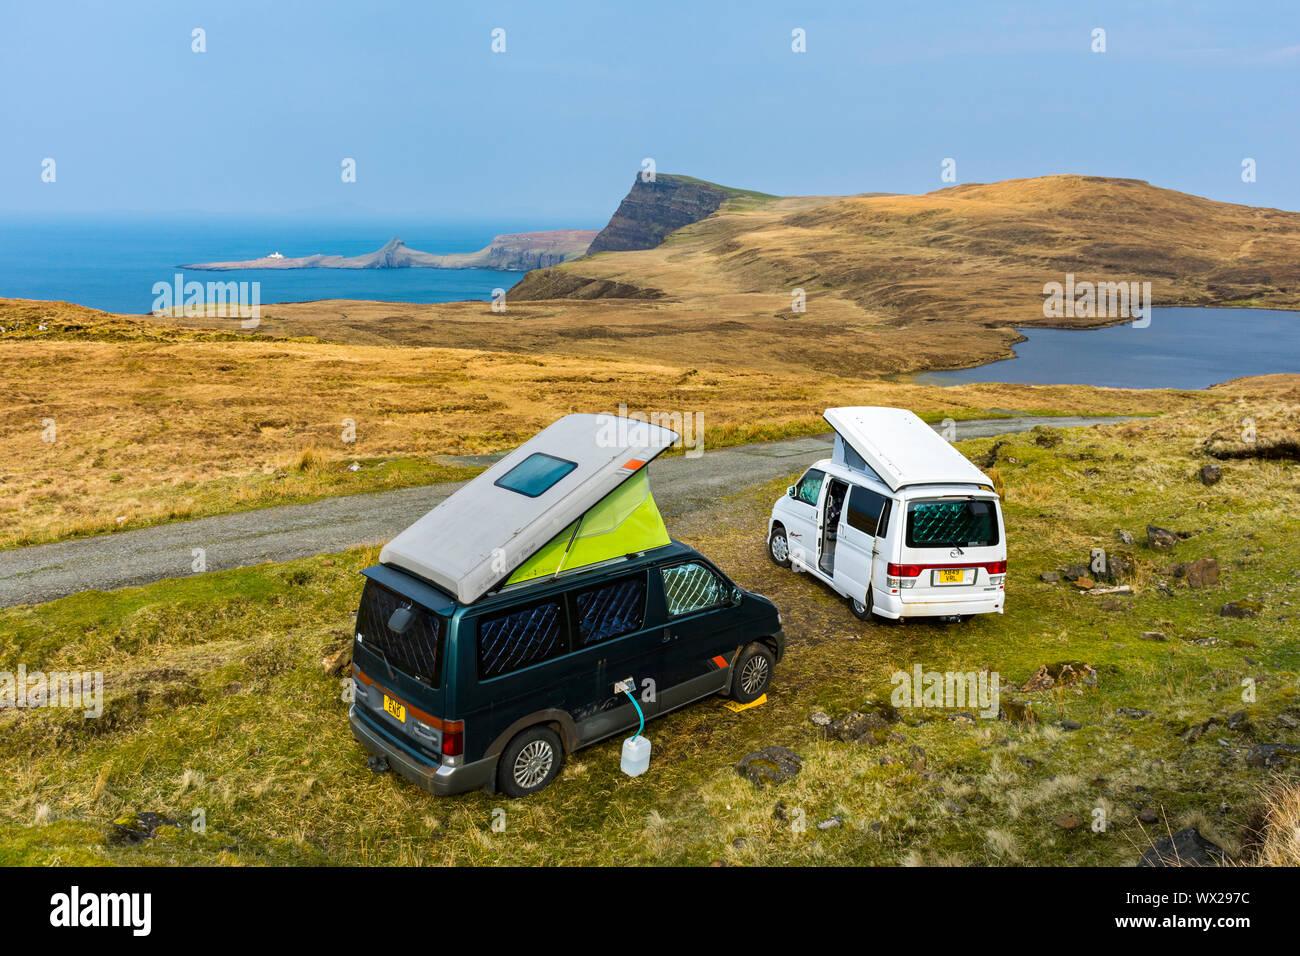 Two Mazda Bongo motor homes wild camping near Loch Eishort, looking towards Waterstein Head and Neist Point, Duirinish, Isle of Skye, Scotland, UK Stock Photo